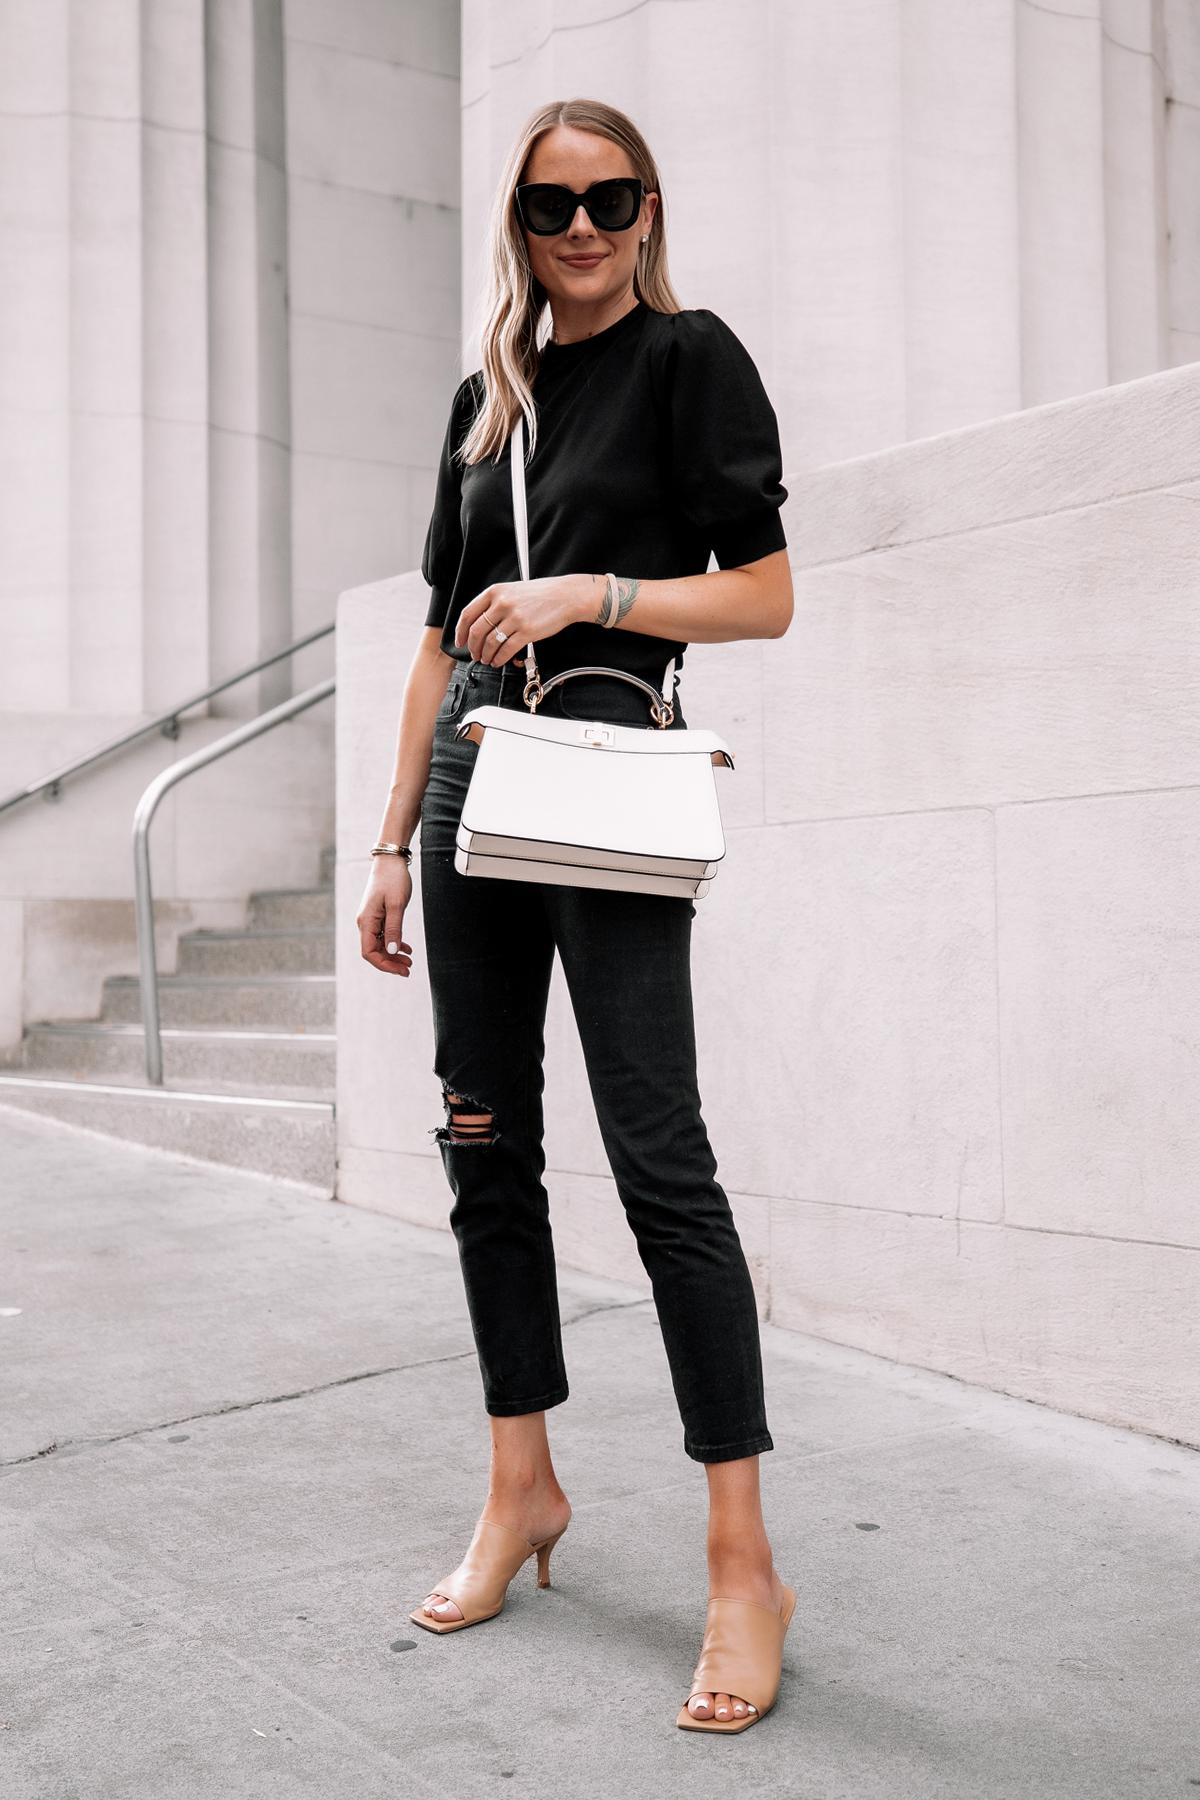 Fashion Jackson Wearing Black Top Black Ripped Jeans Nude Heeld Sandals Fendi White Peekaboo Handbag Street Style 1